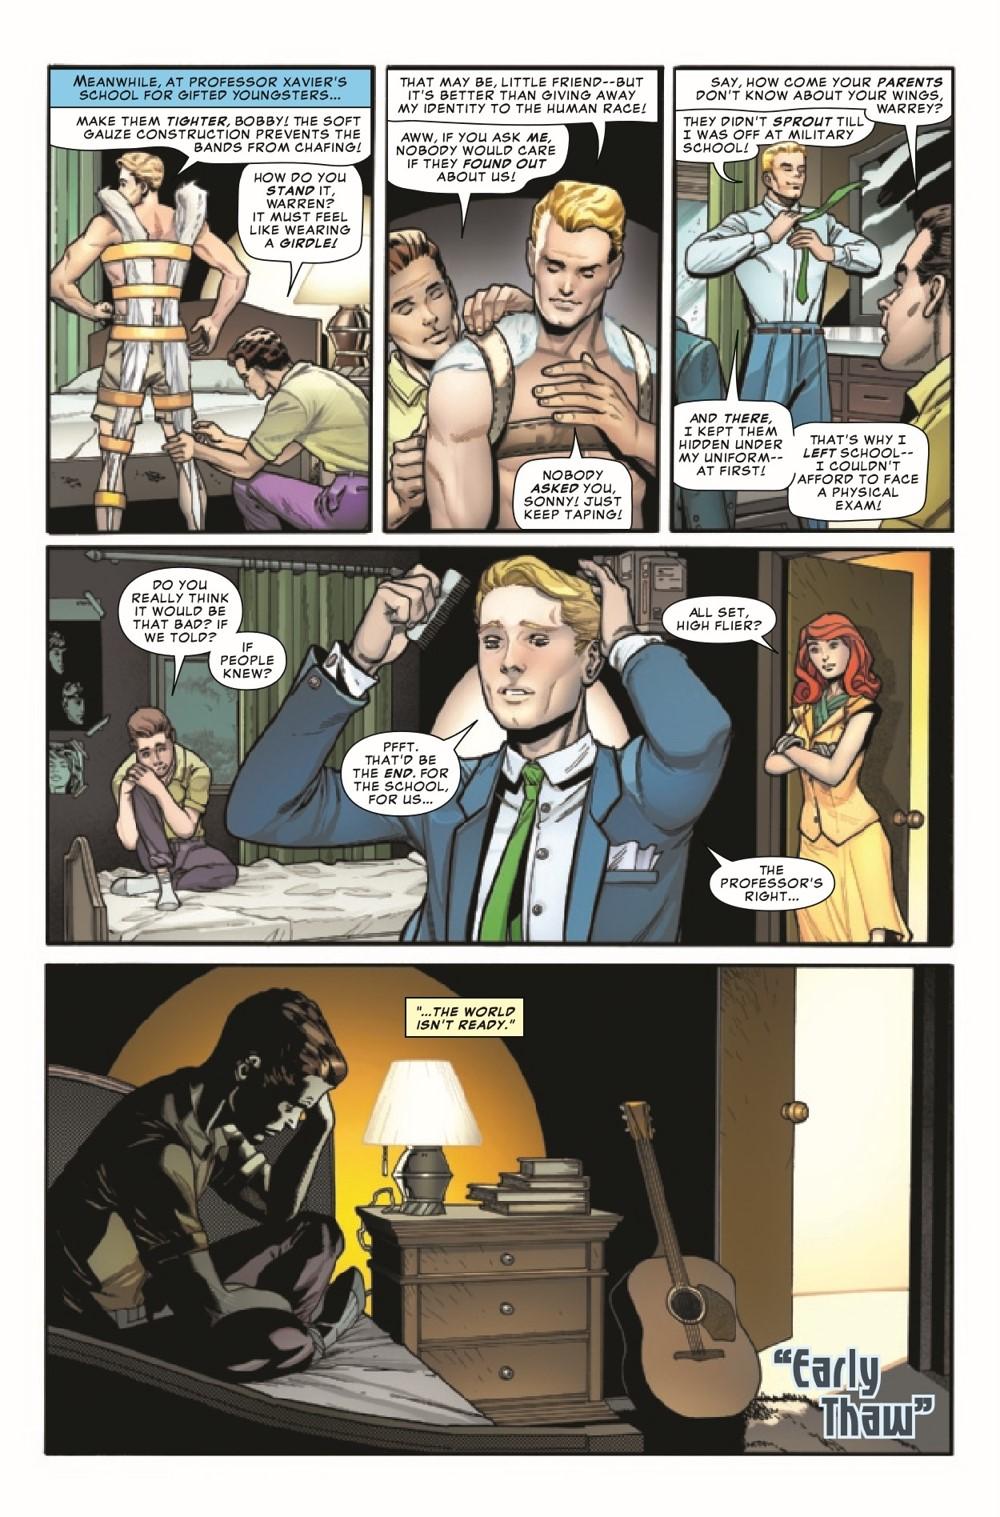 MARVOICESPRIDE2021001_Preview-10 ComicList Previews: MARVEL'S VOICES PRIDE #1